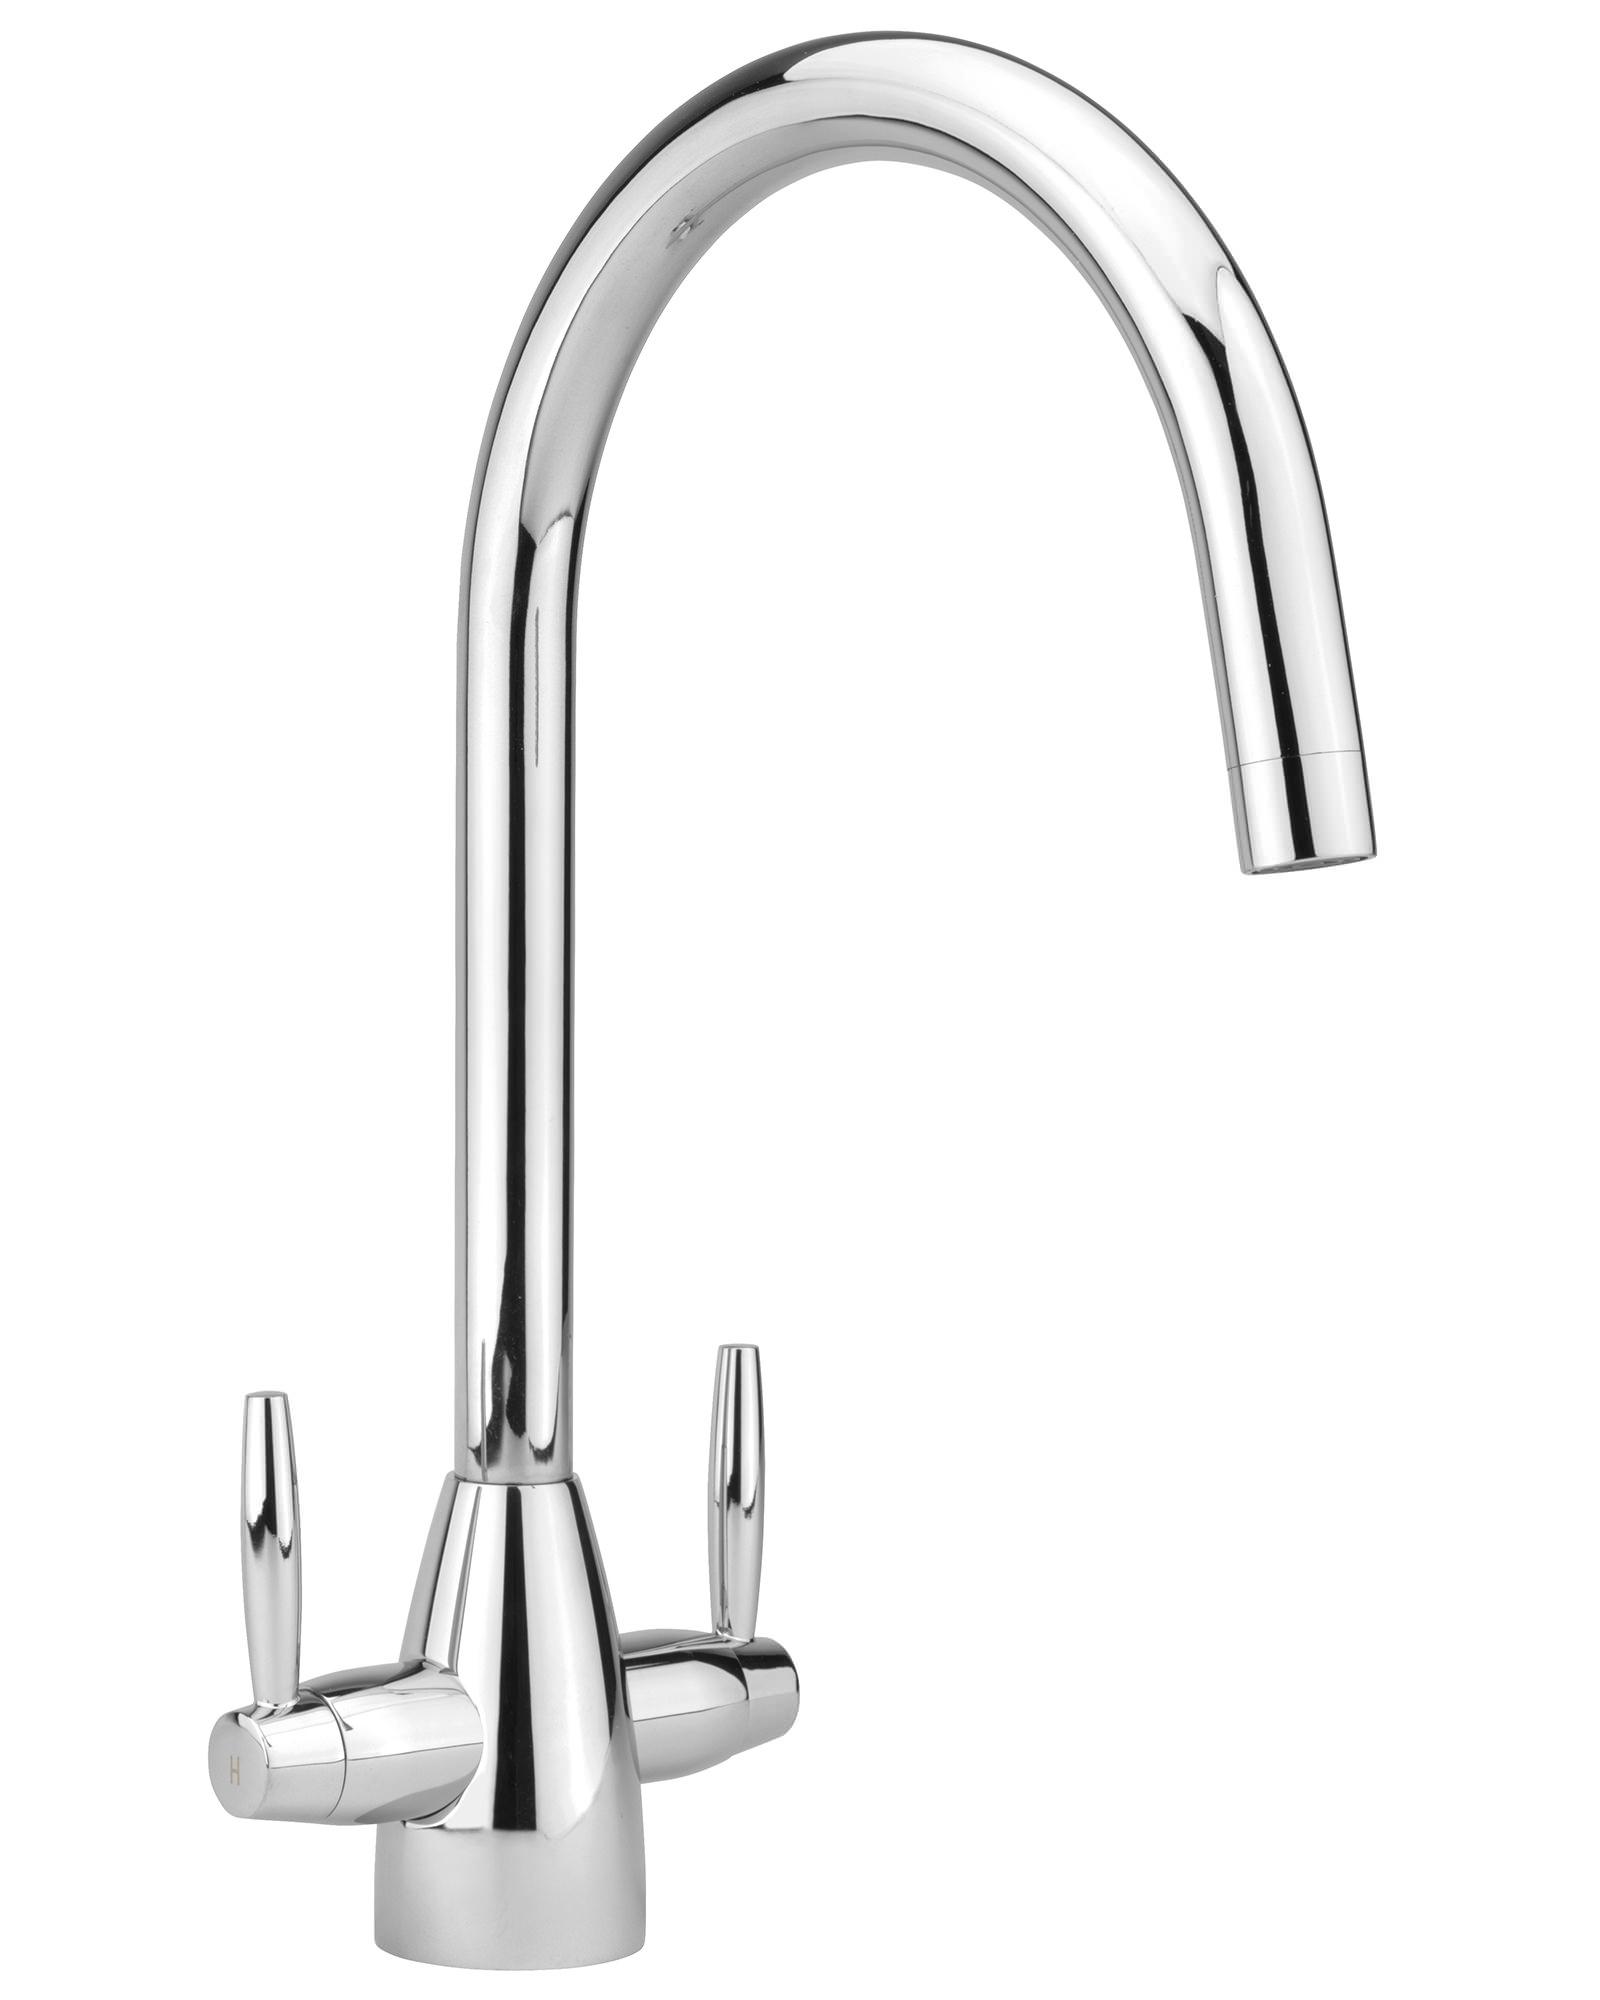 Sagittarius Forme Chrome Monobloc Kitchen Sink Mixer Tap